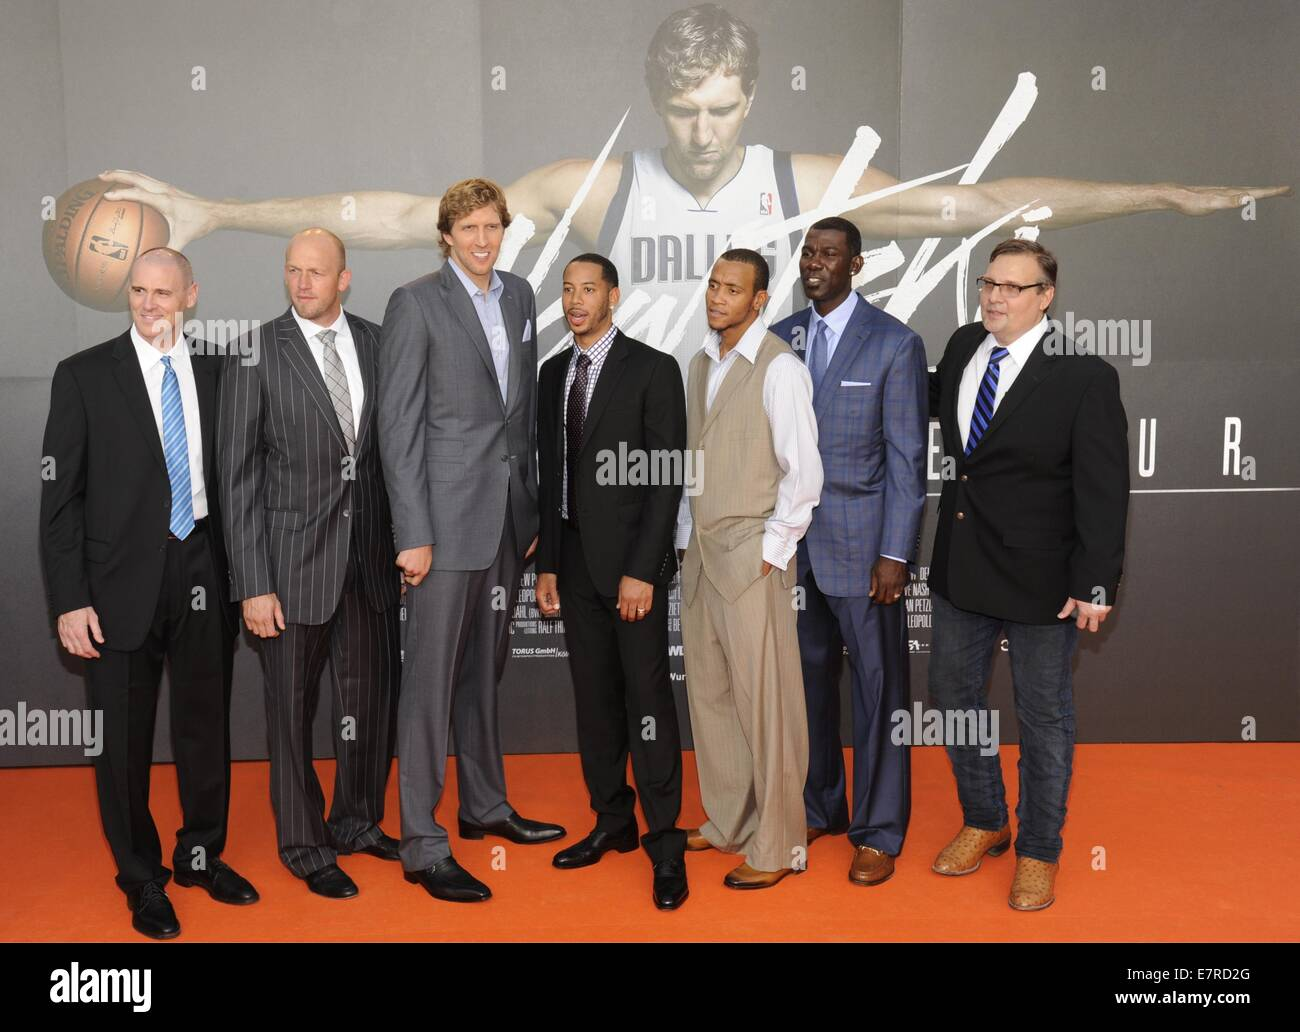 NBA coach Rick Carlisle (L-R), NBA player Brian Cardinal, Dirk Nowitzki, Devin Harris, Monta Ellis, Michael Finley Stock Photo